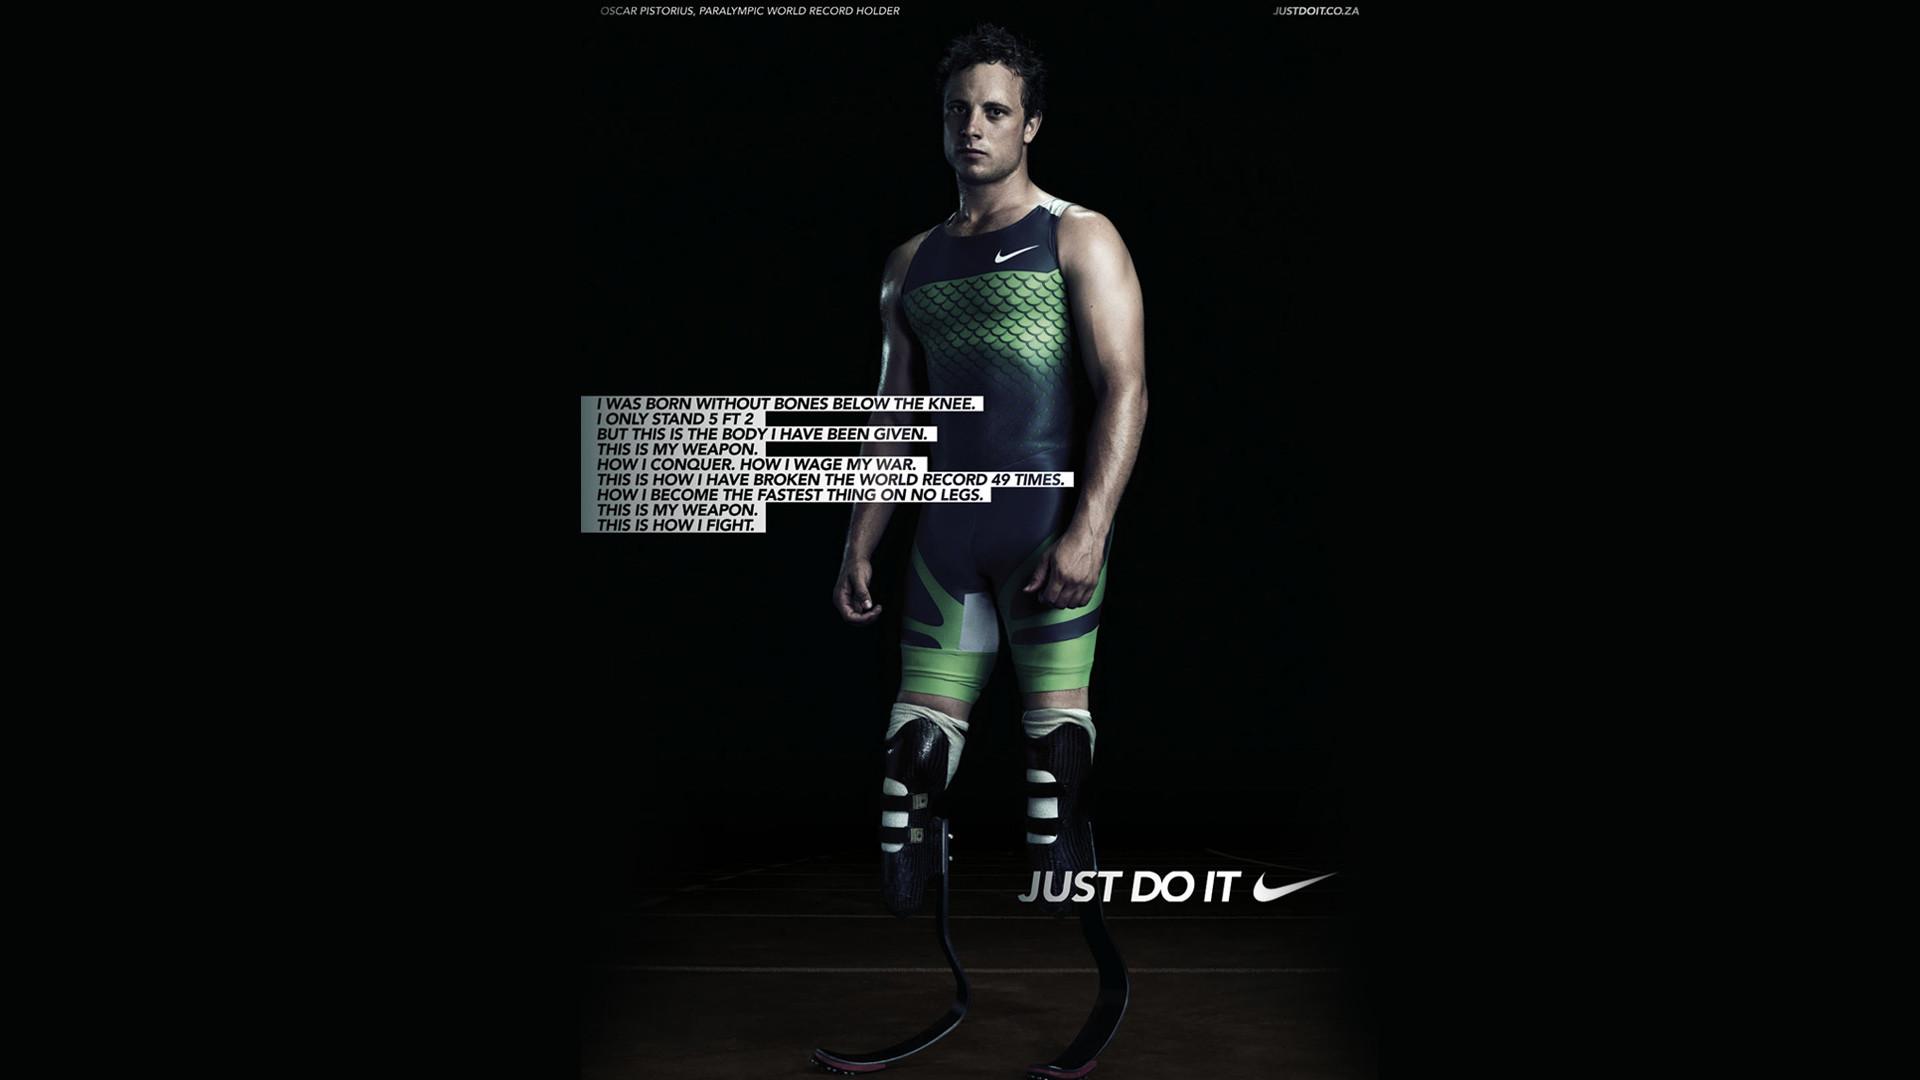 Fitness Motivational Quotes | Nike motivation wallpaper – Motivation Blog –  Motivation quotes